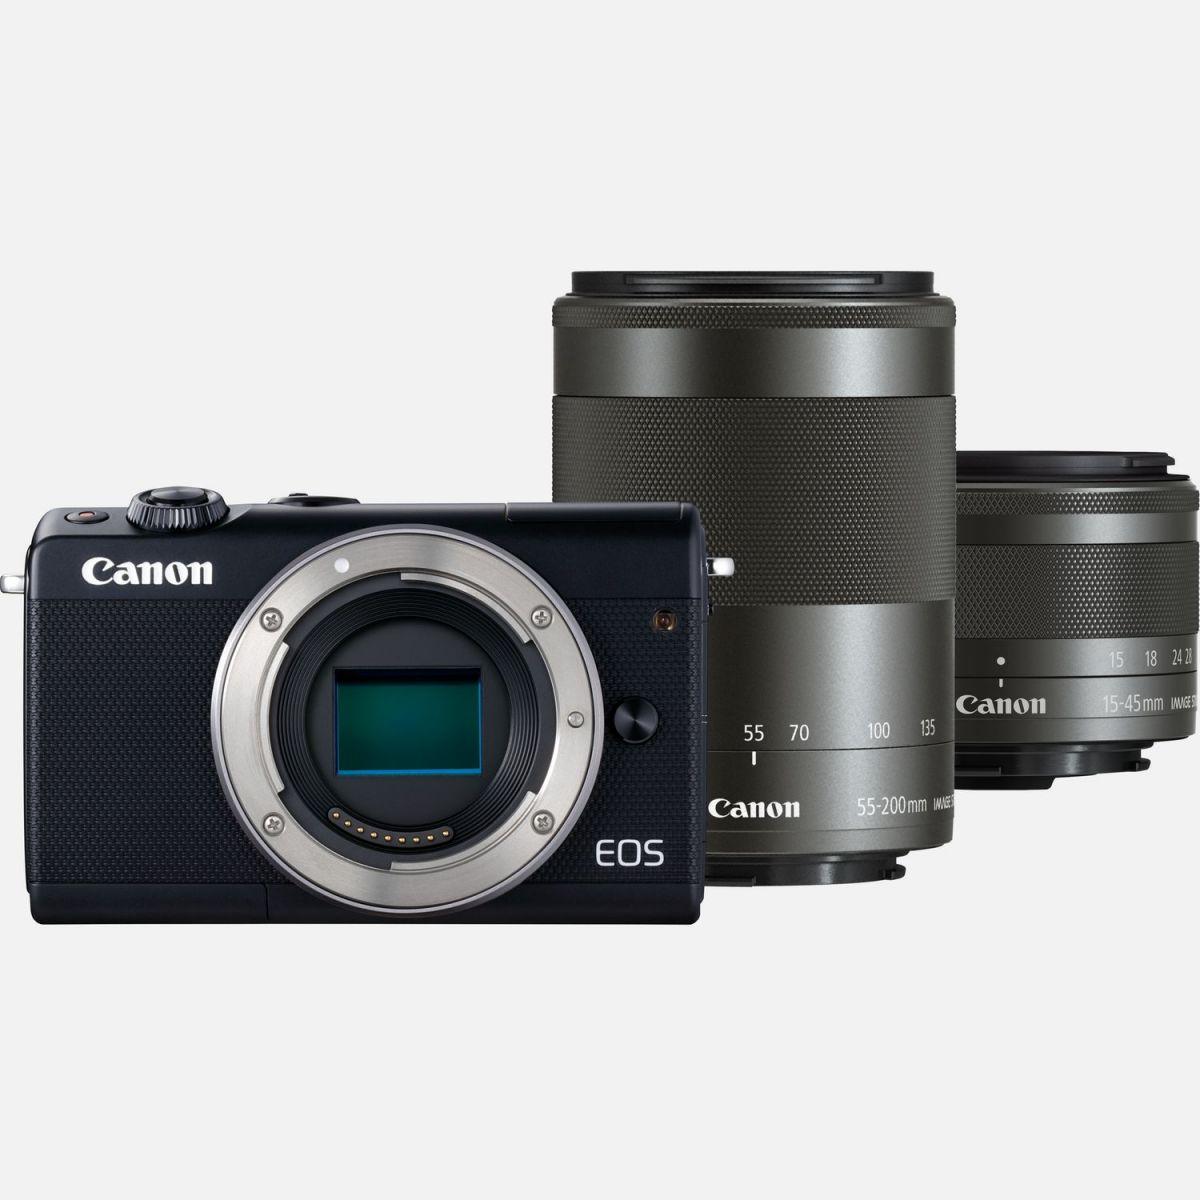 CANON EOS M 3 KIT 15-45MM IS STM +M55-200 IS STM BLACK